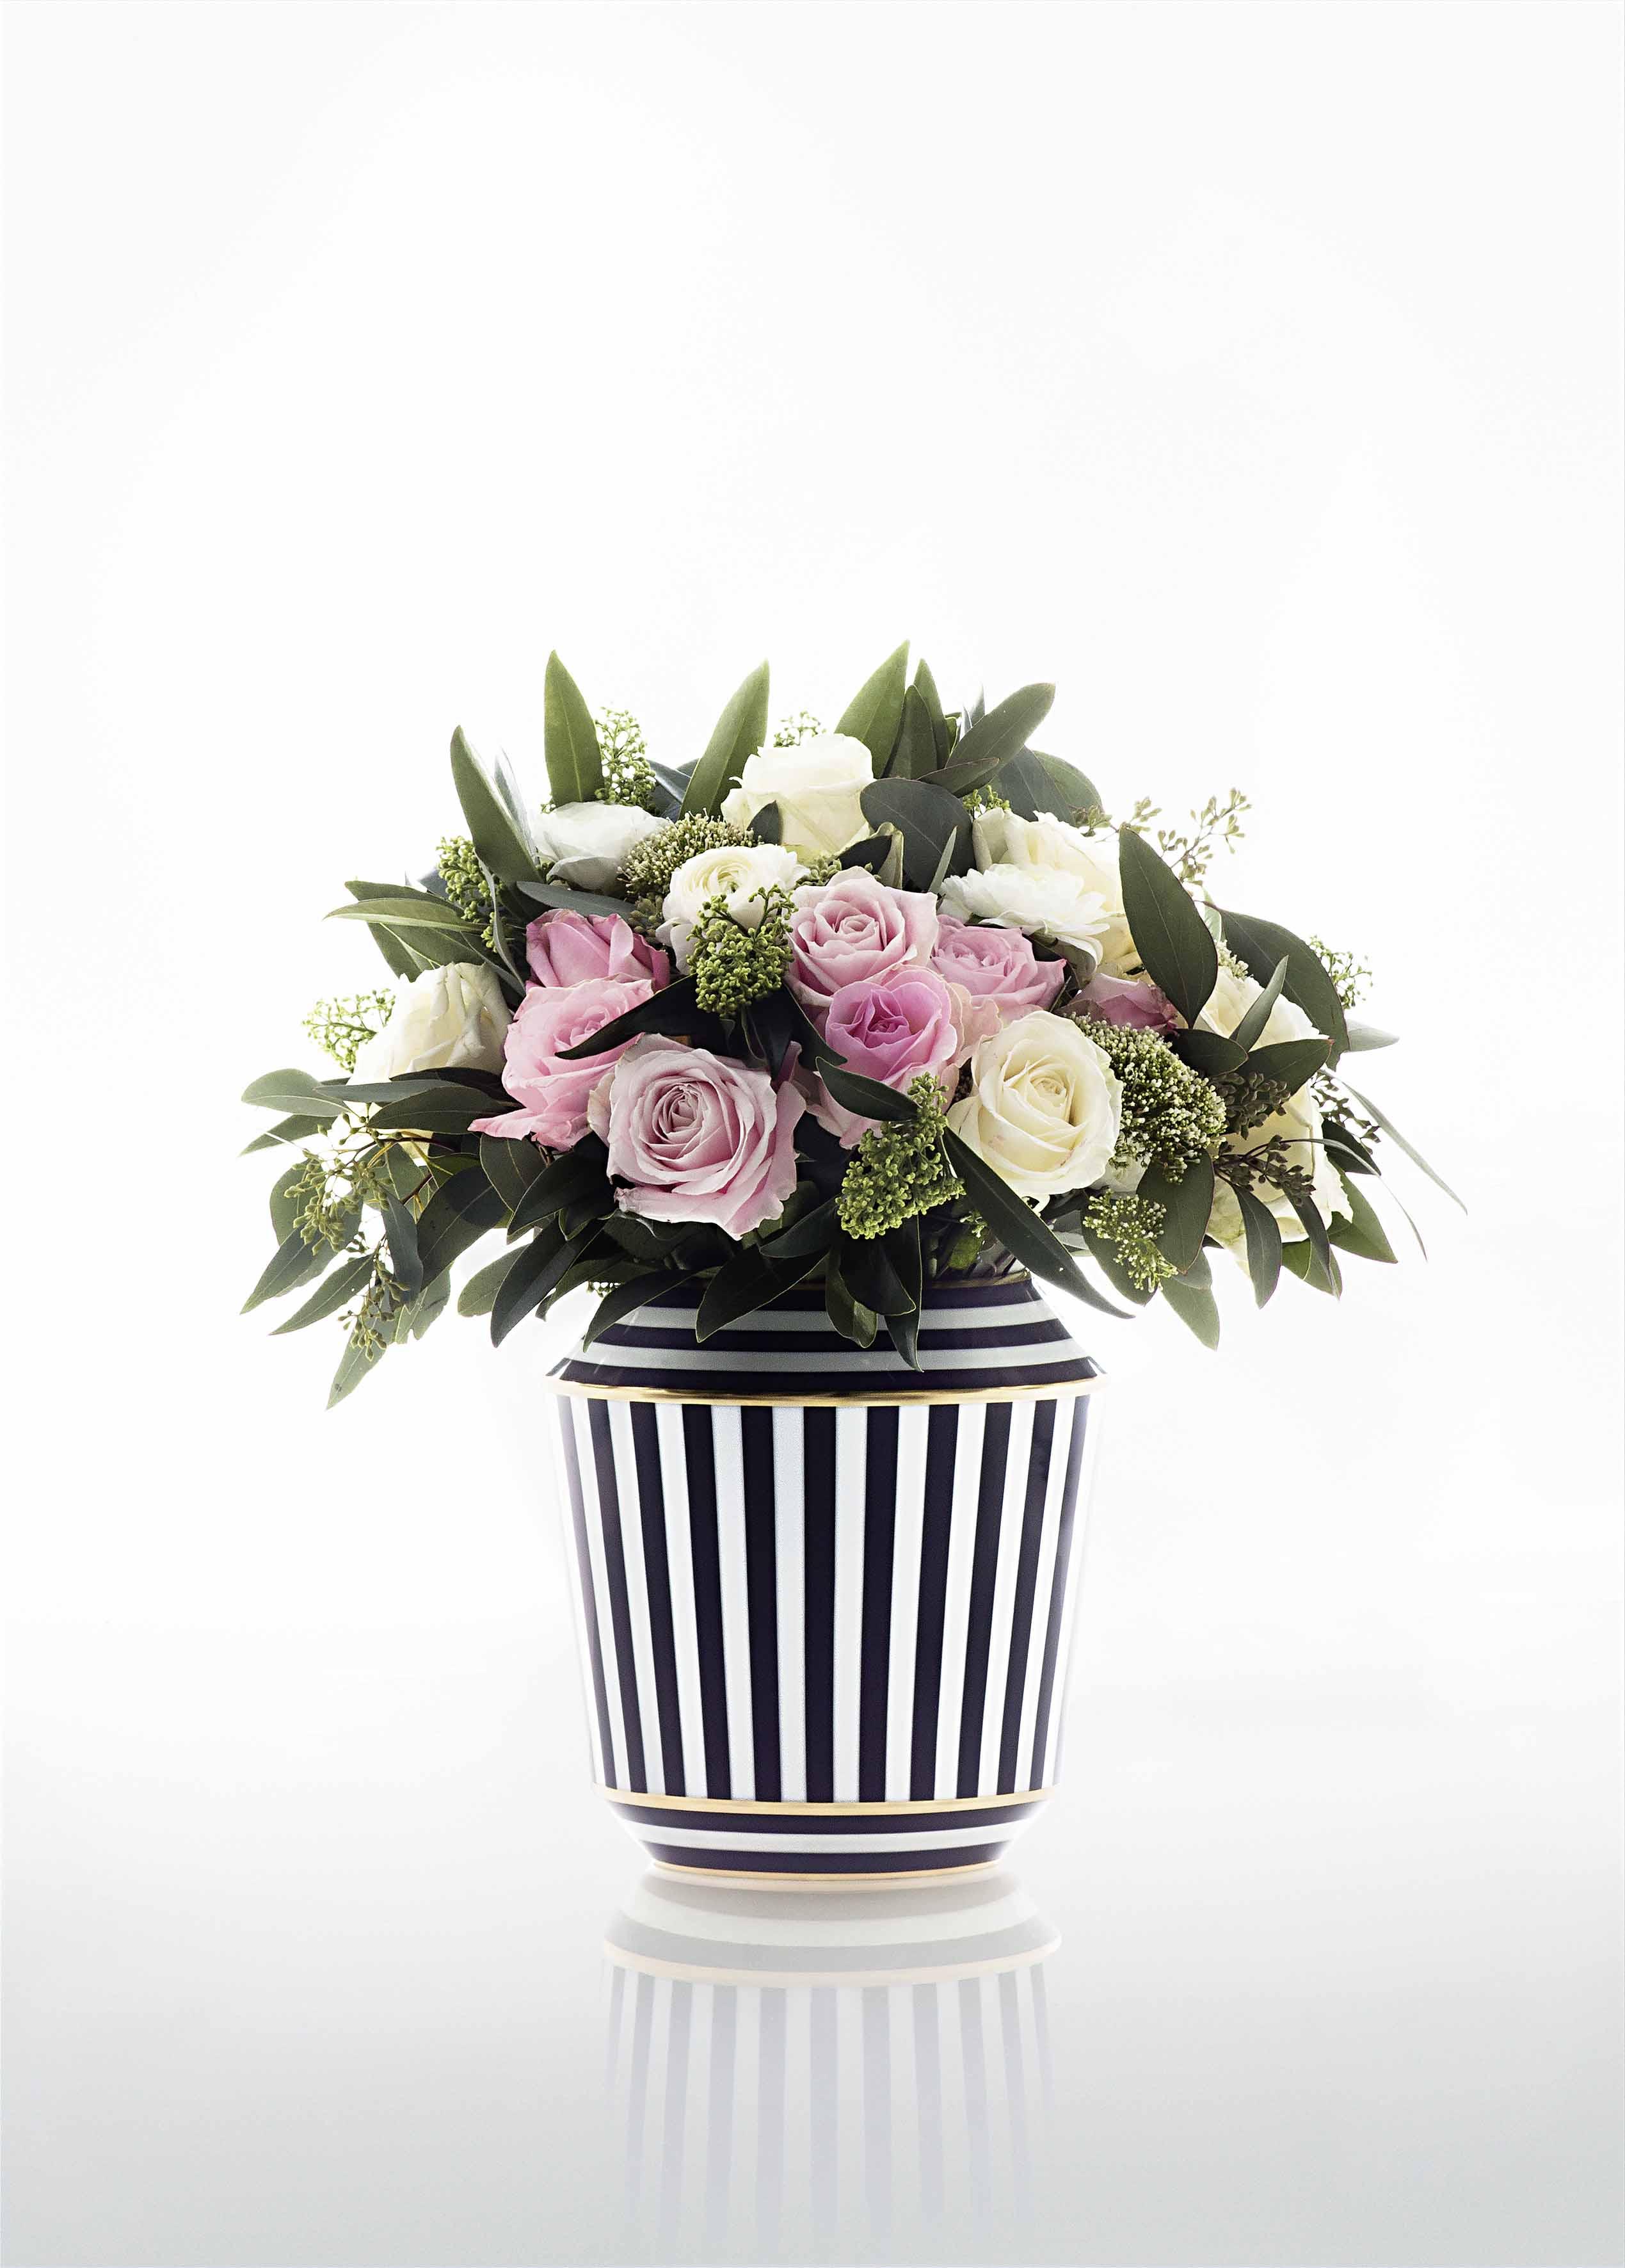 Furstenberg Vases